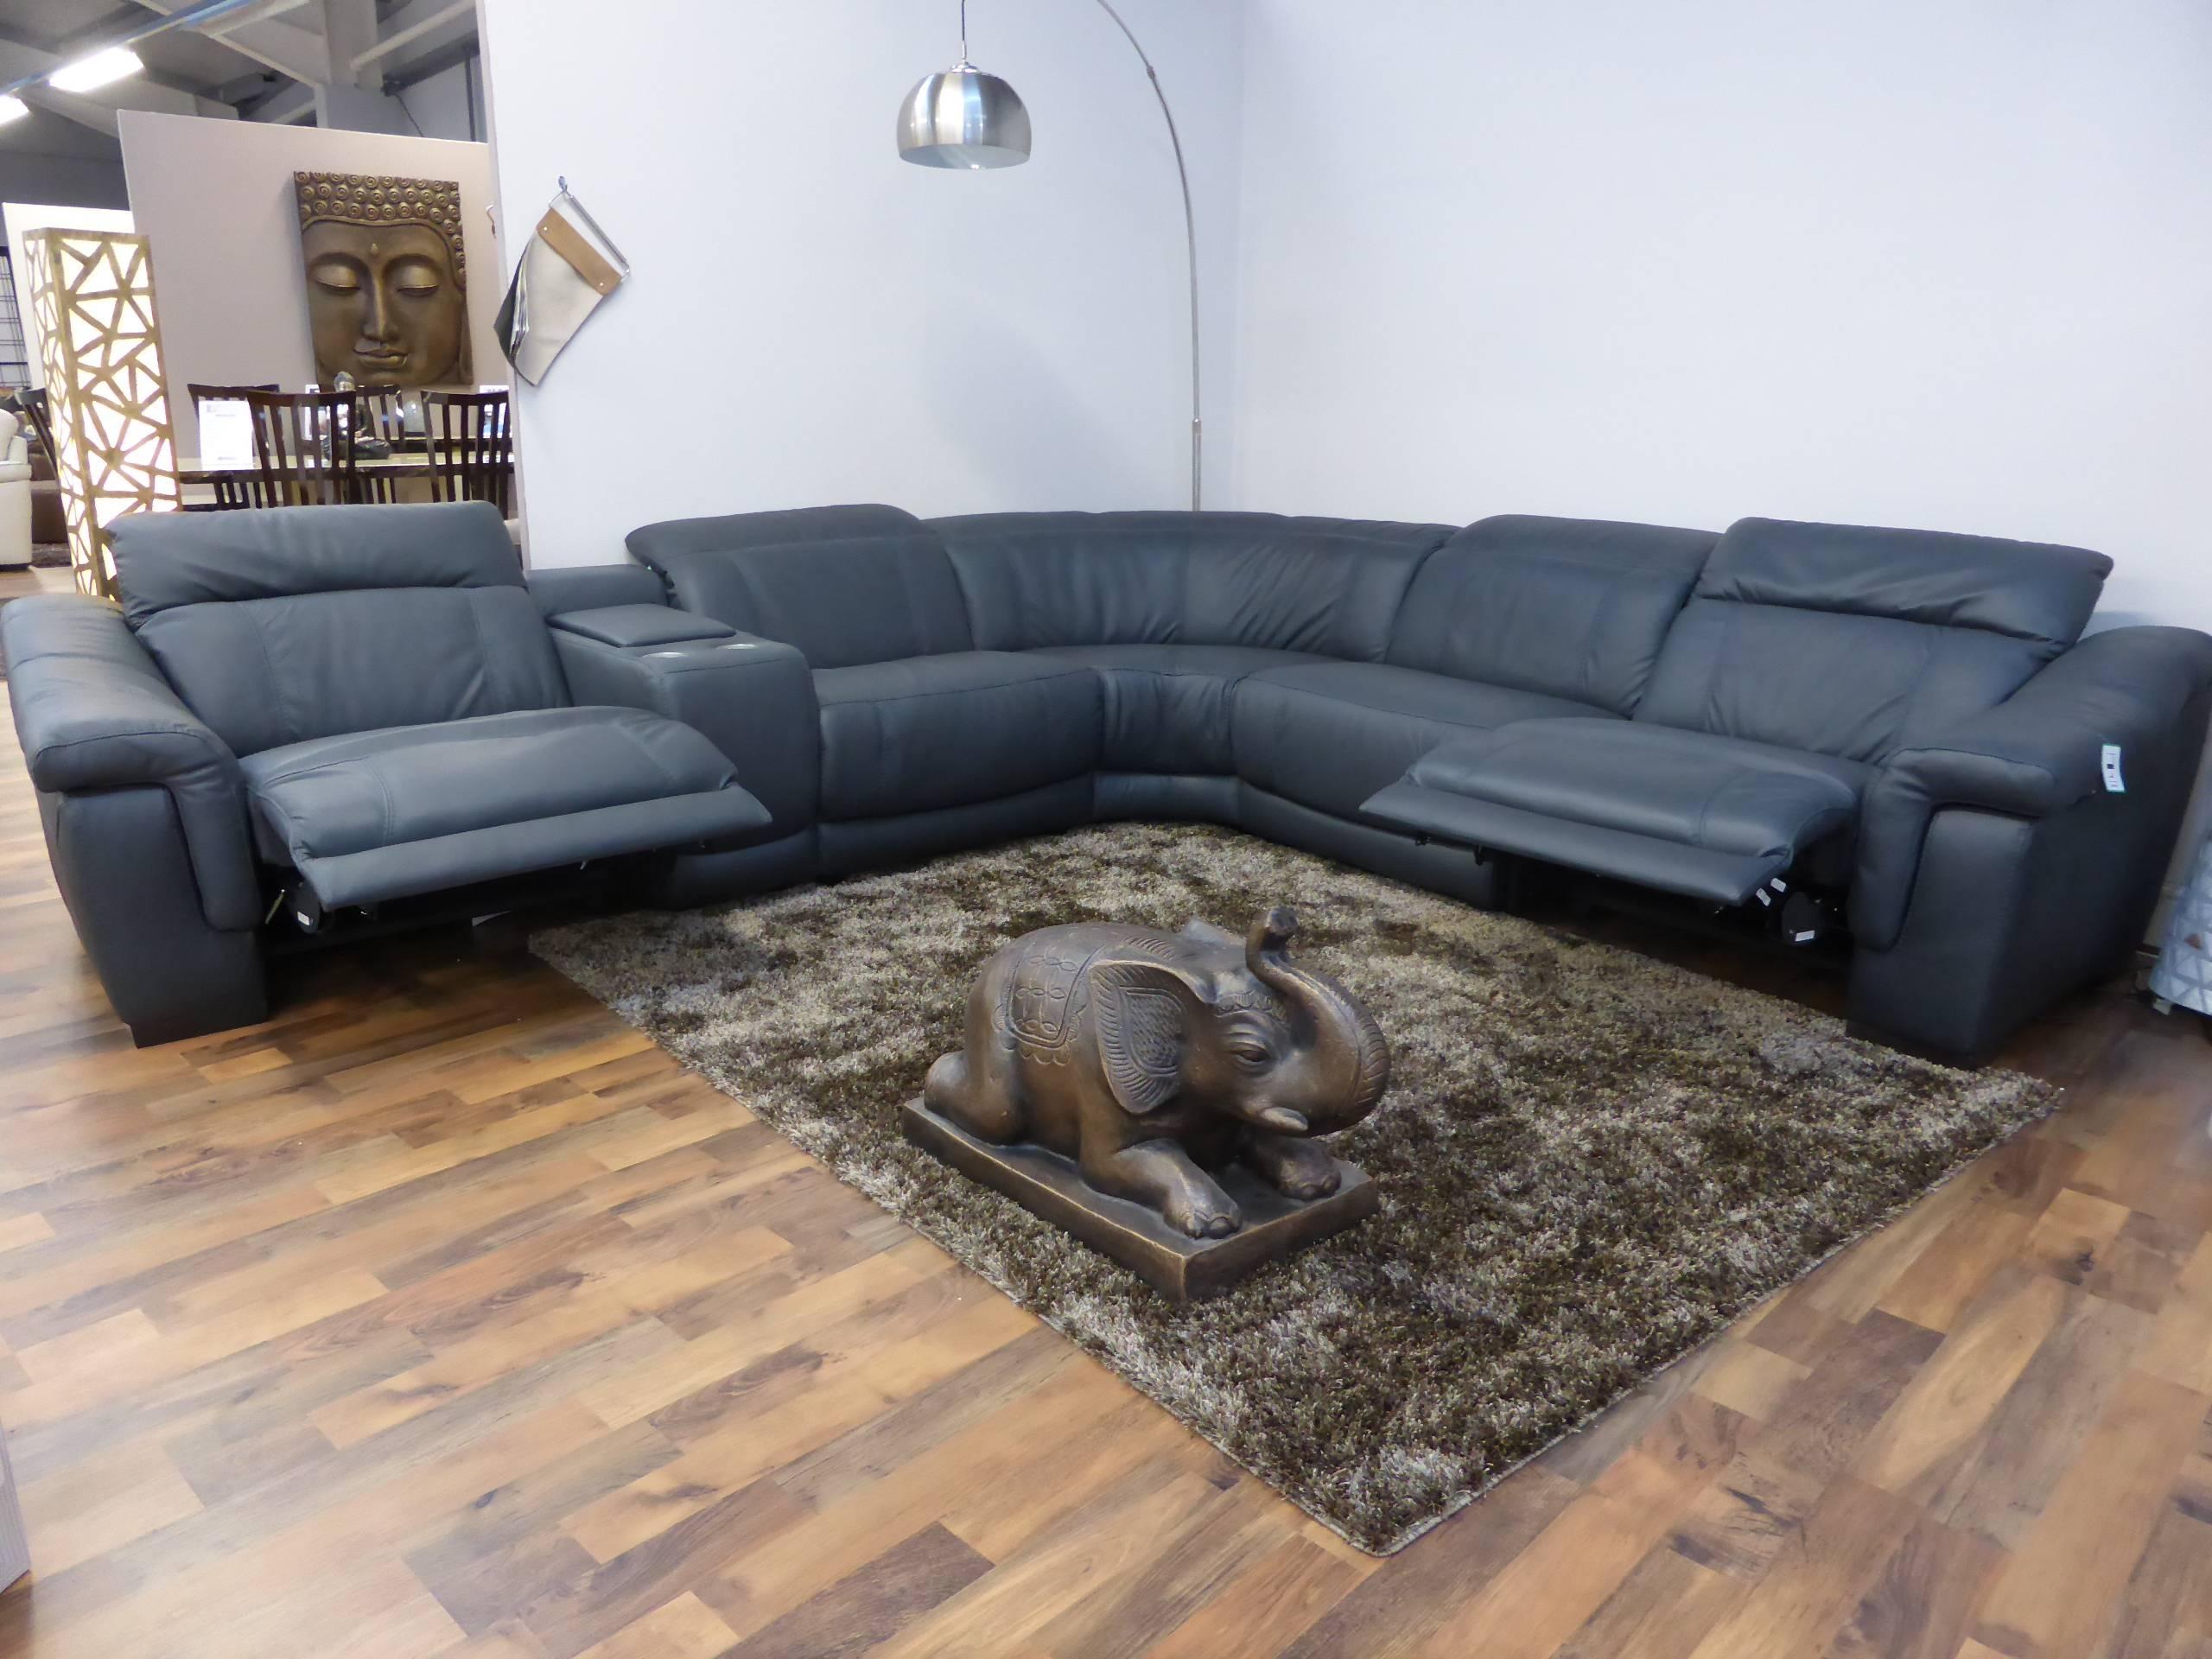 Corner Recliner Sofa Fabric – Fjellkjeden In Italian Recliner Sofas (View 7 of 15)